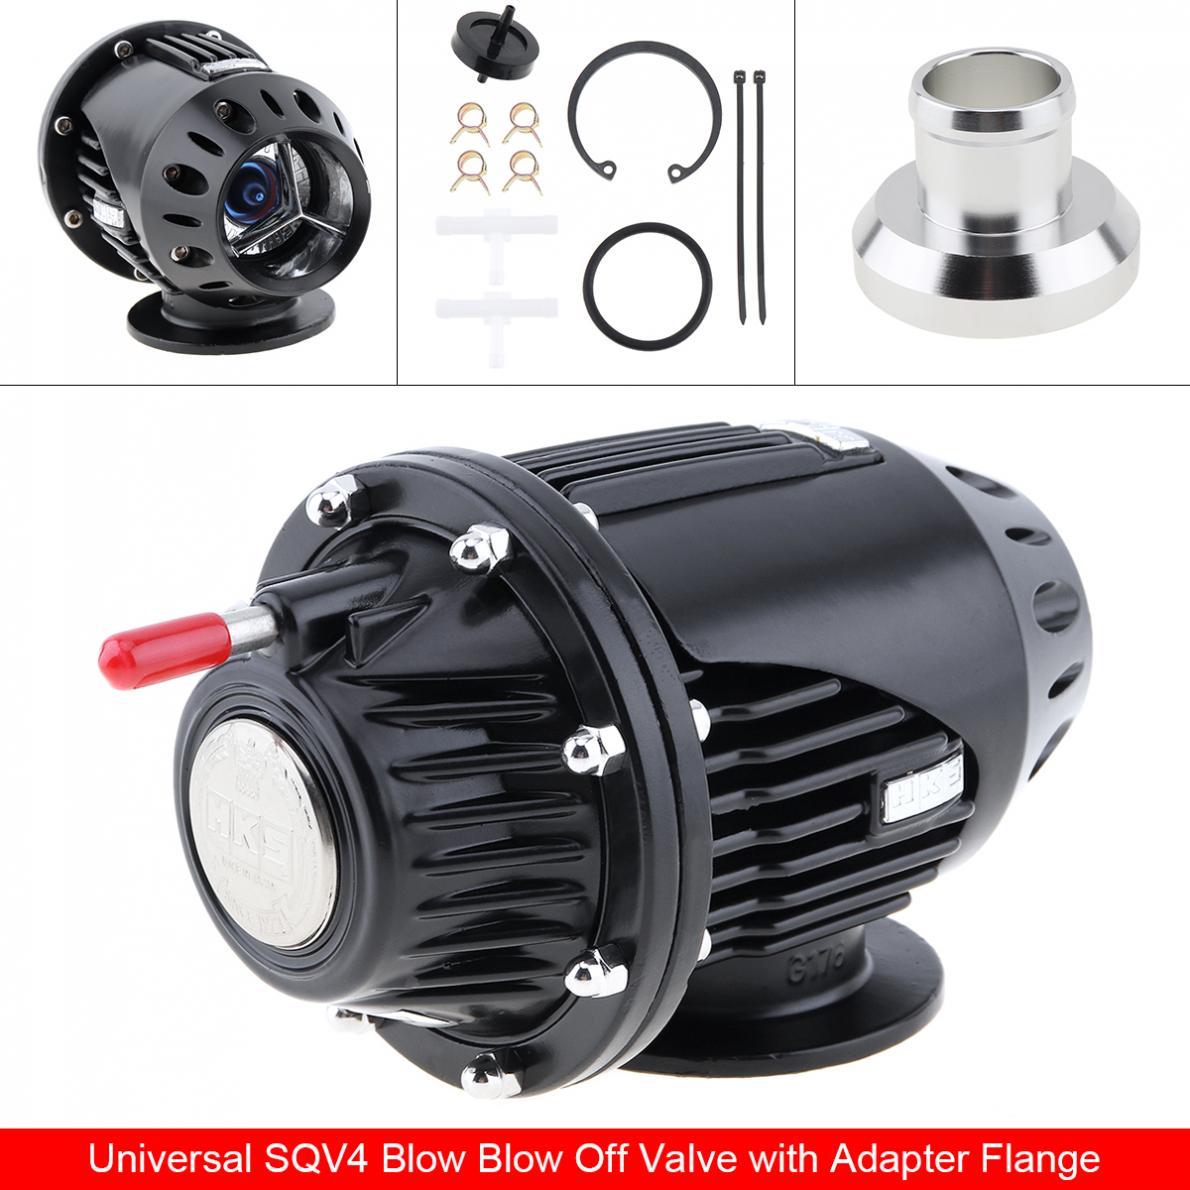 Universal Schwarz SQV4 SQV 4 IV Bov Turbo Pull-Typ Blow Off Ventil Bov Abgas Ventil mit Adapter Flansch